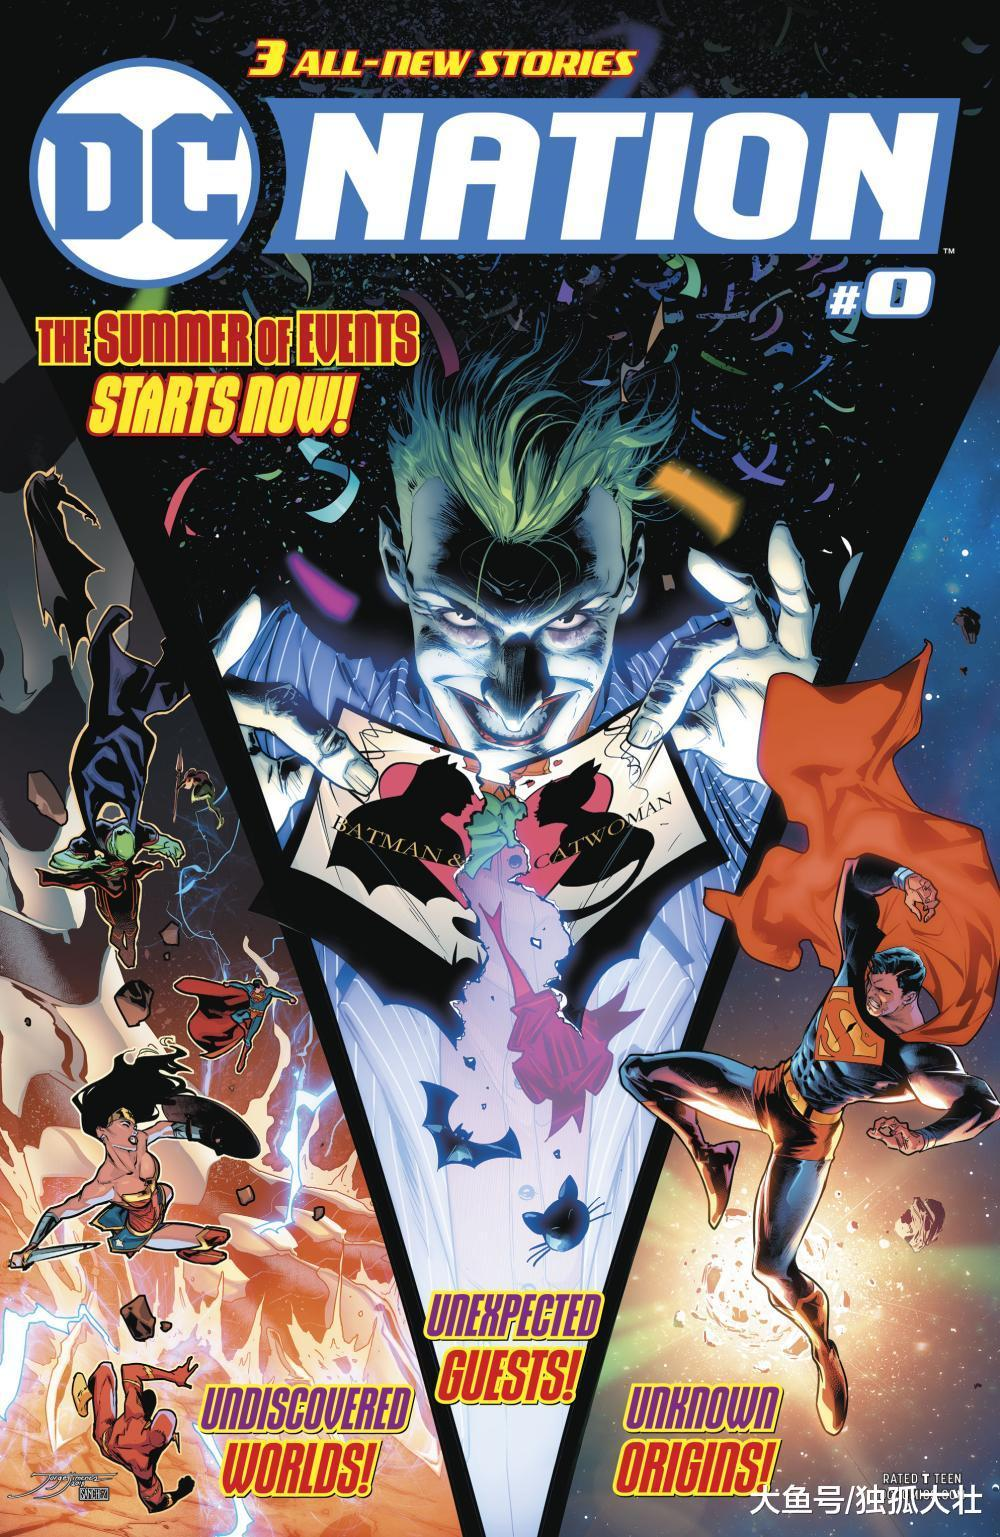 DC宇宙重生的真相, 蝙蝠侠早就觉察到了曼哈顿博士的存在!